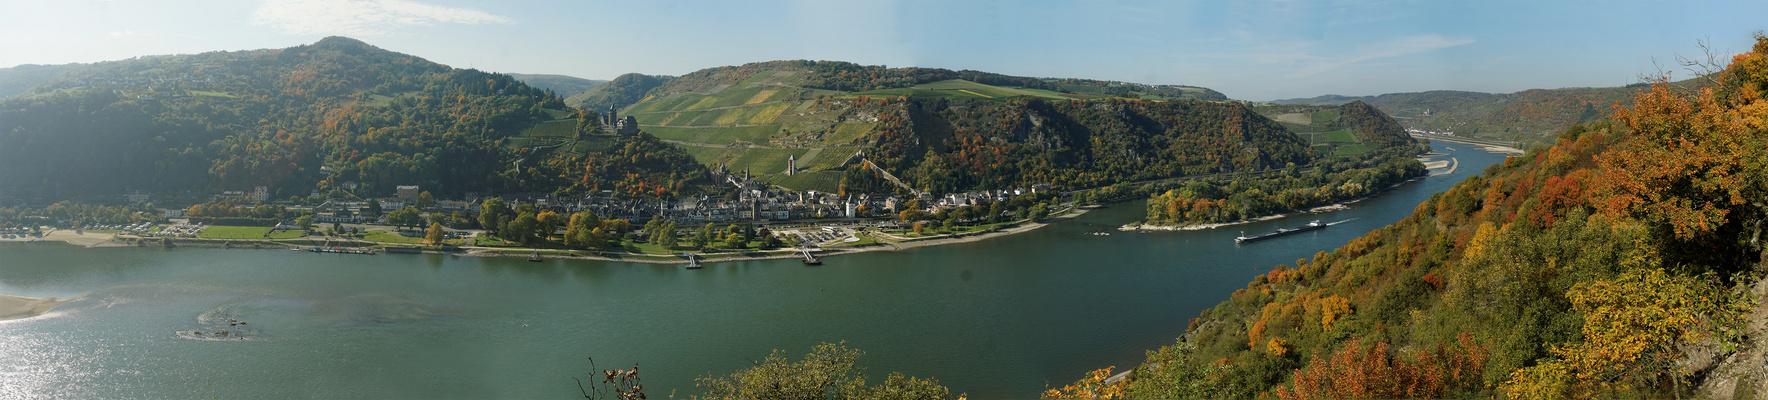 Panorama auf Bacharach im Mittelrheintal